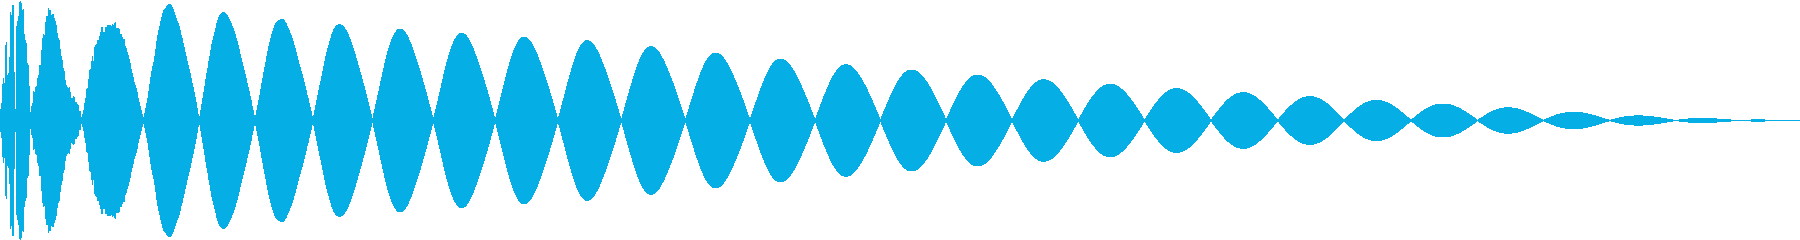 DTM Kick 95 オリジナル音源の再生済みの波形